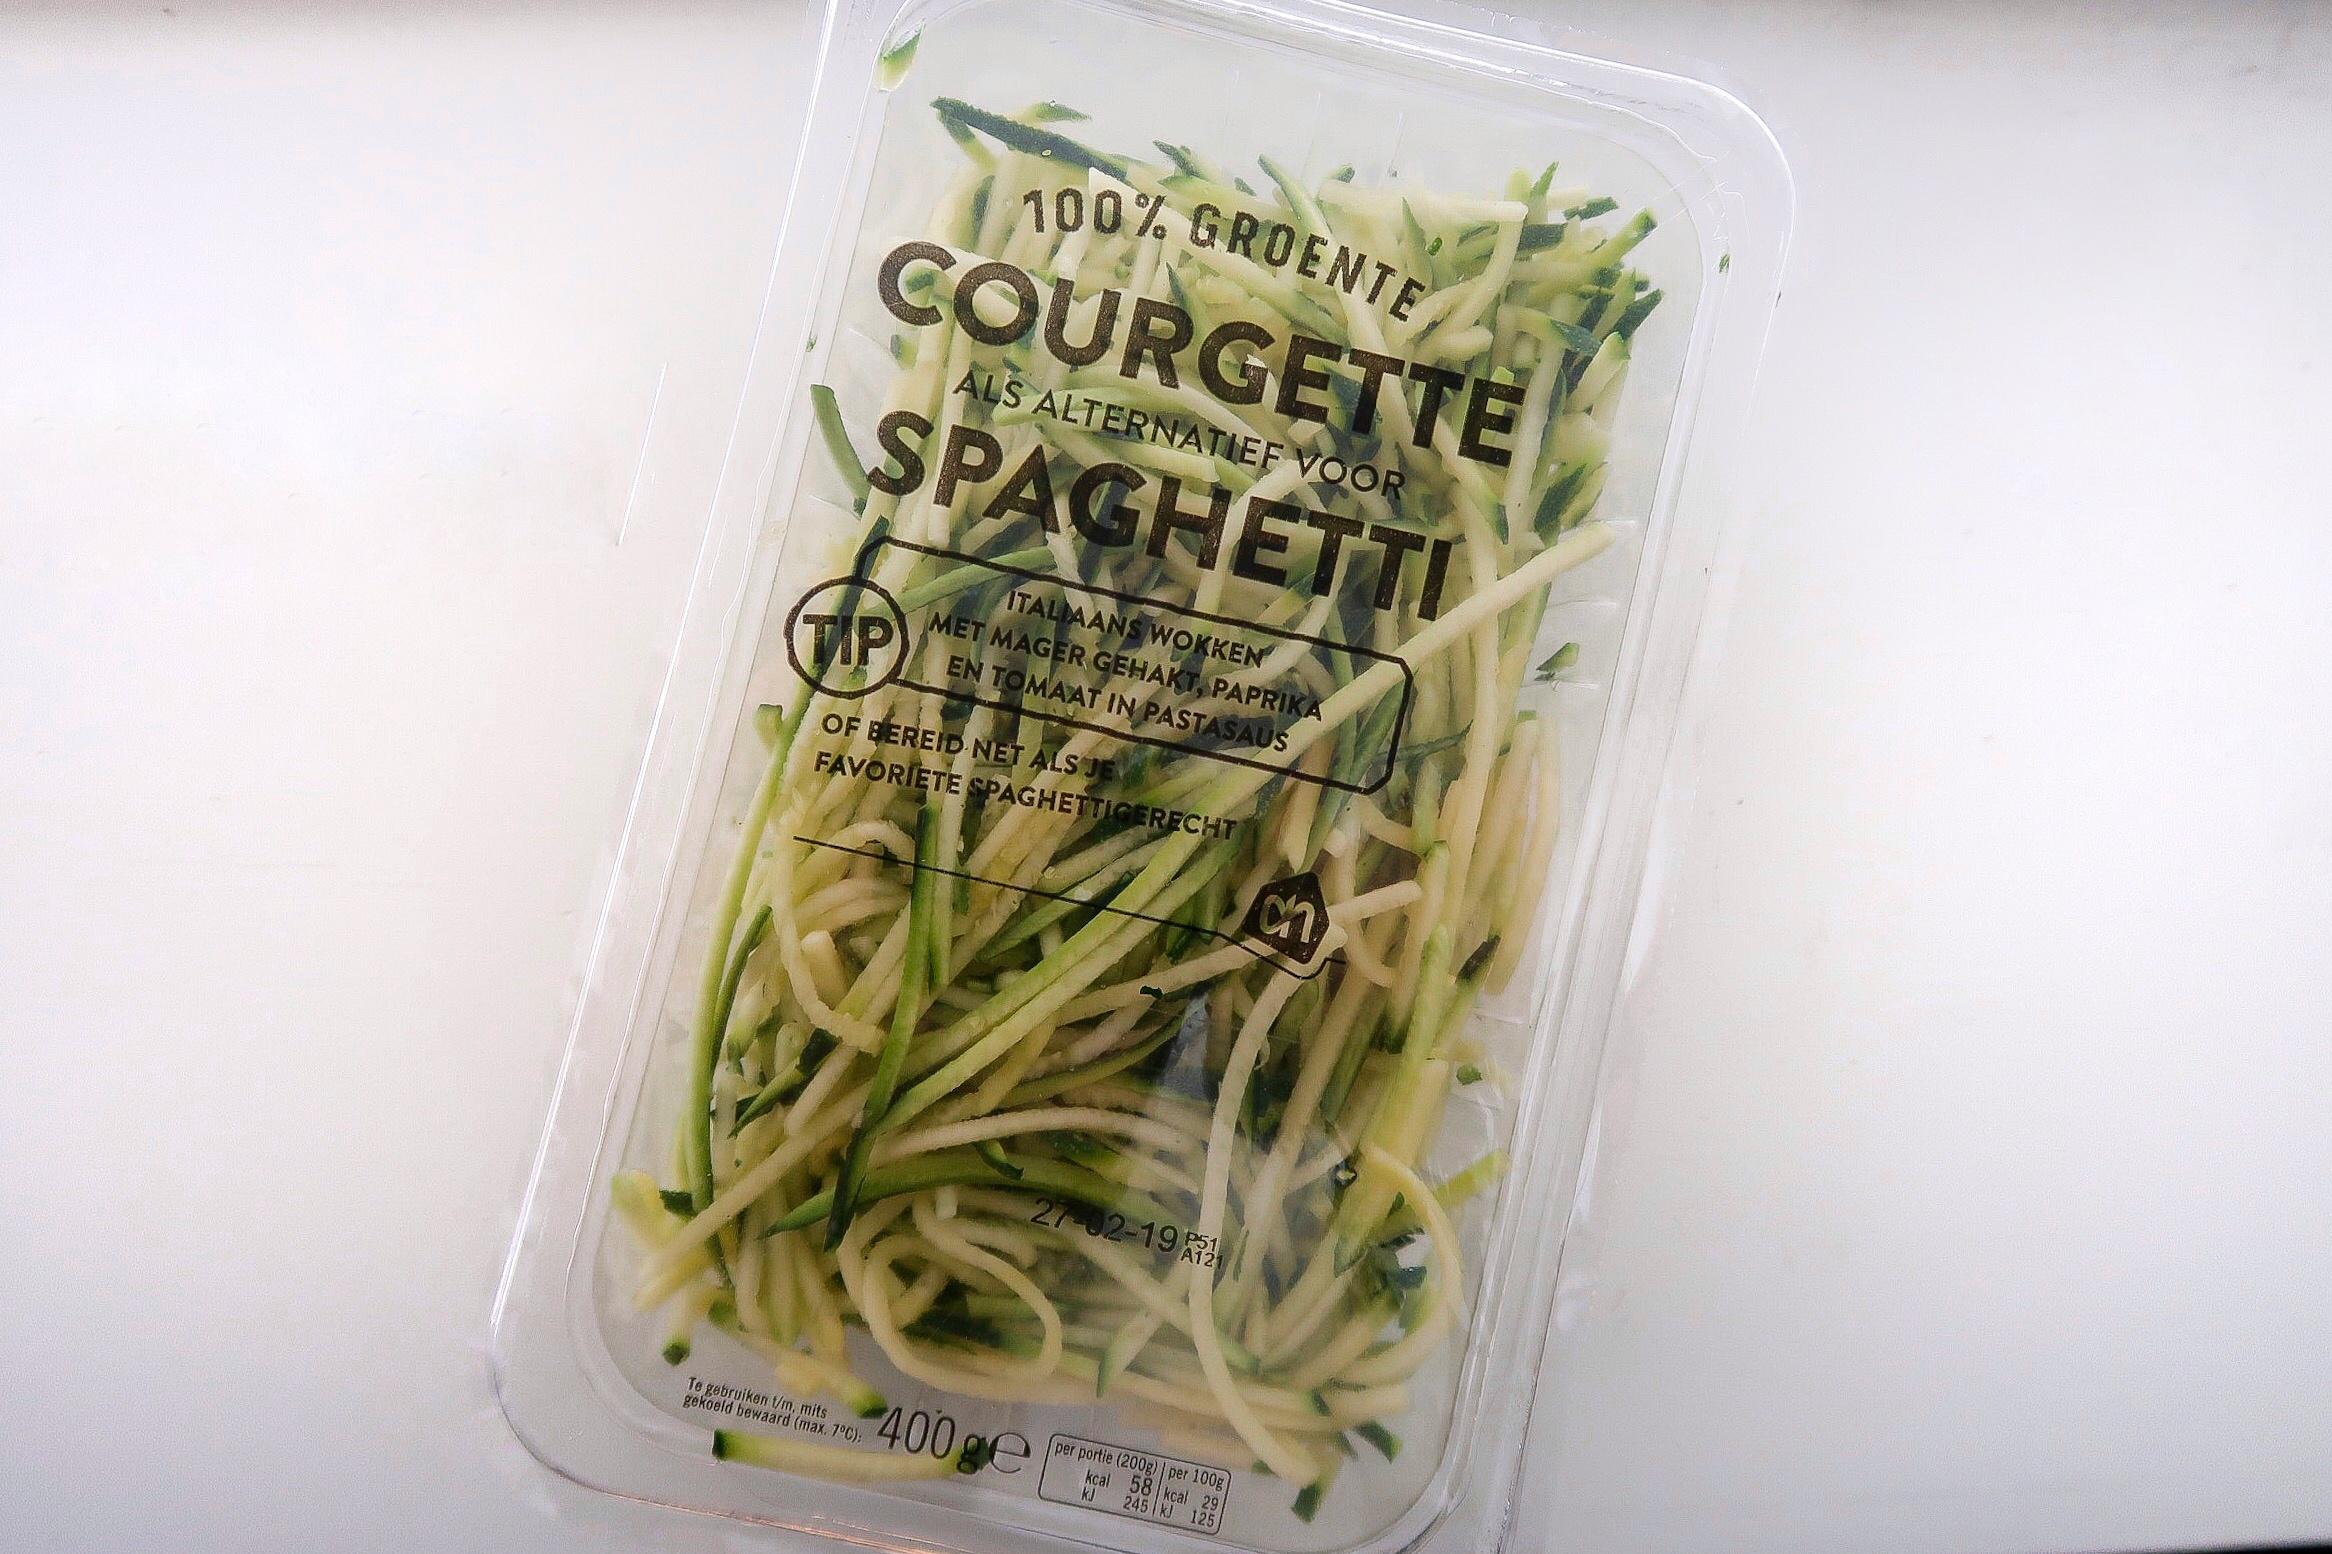 gezonde producten, product tips, gezonde voeding, afvallen, vet verliezen, gymjunkie lifestyle plan, gezond afvallen, courgette spaghetti